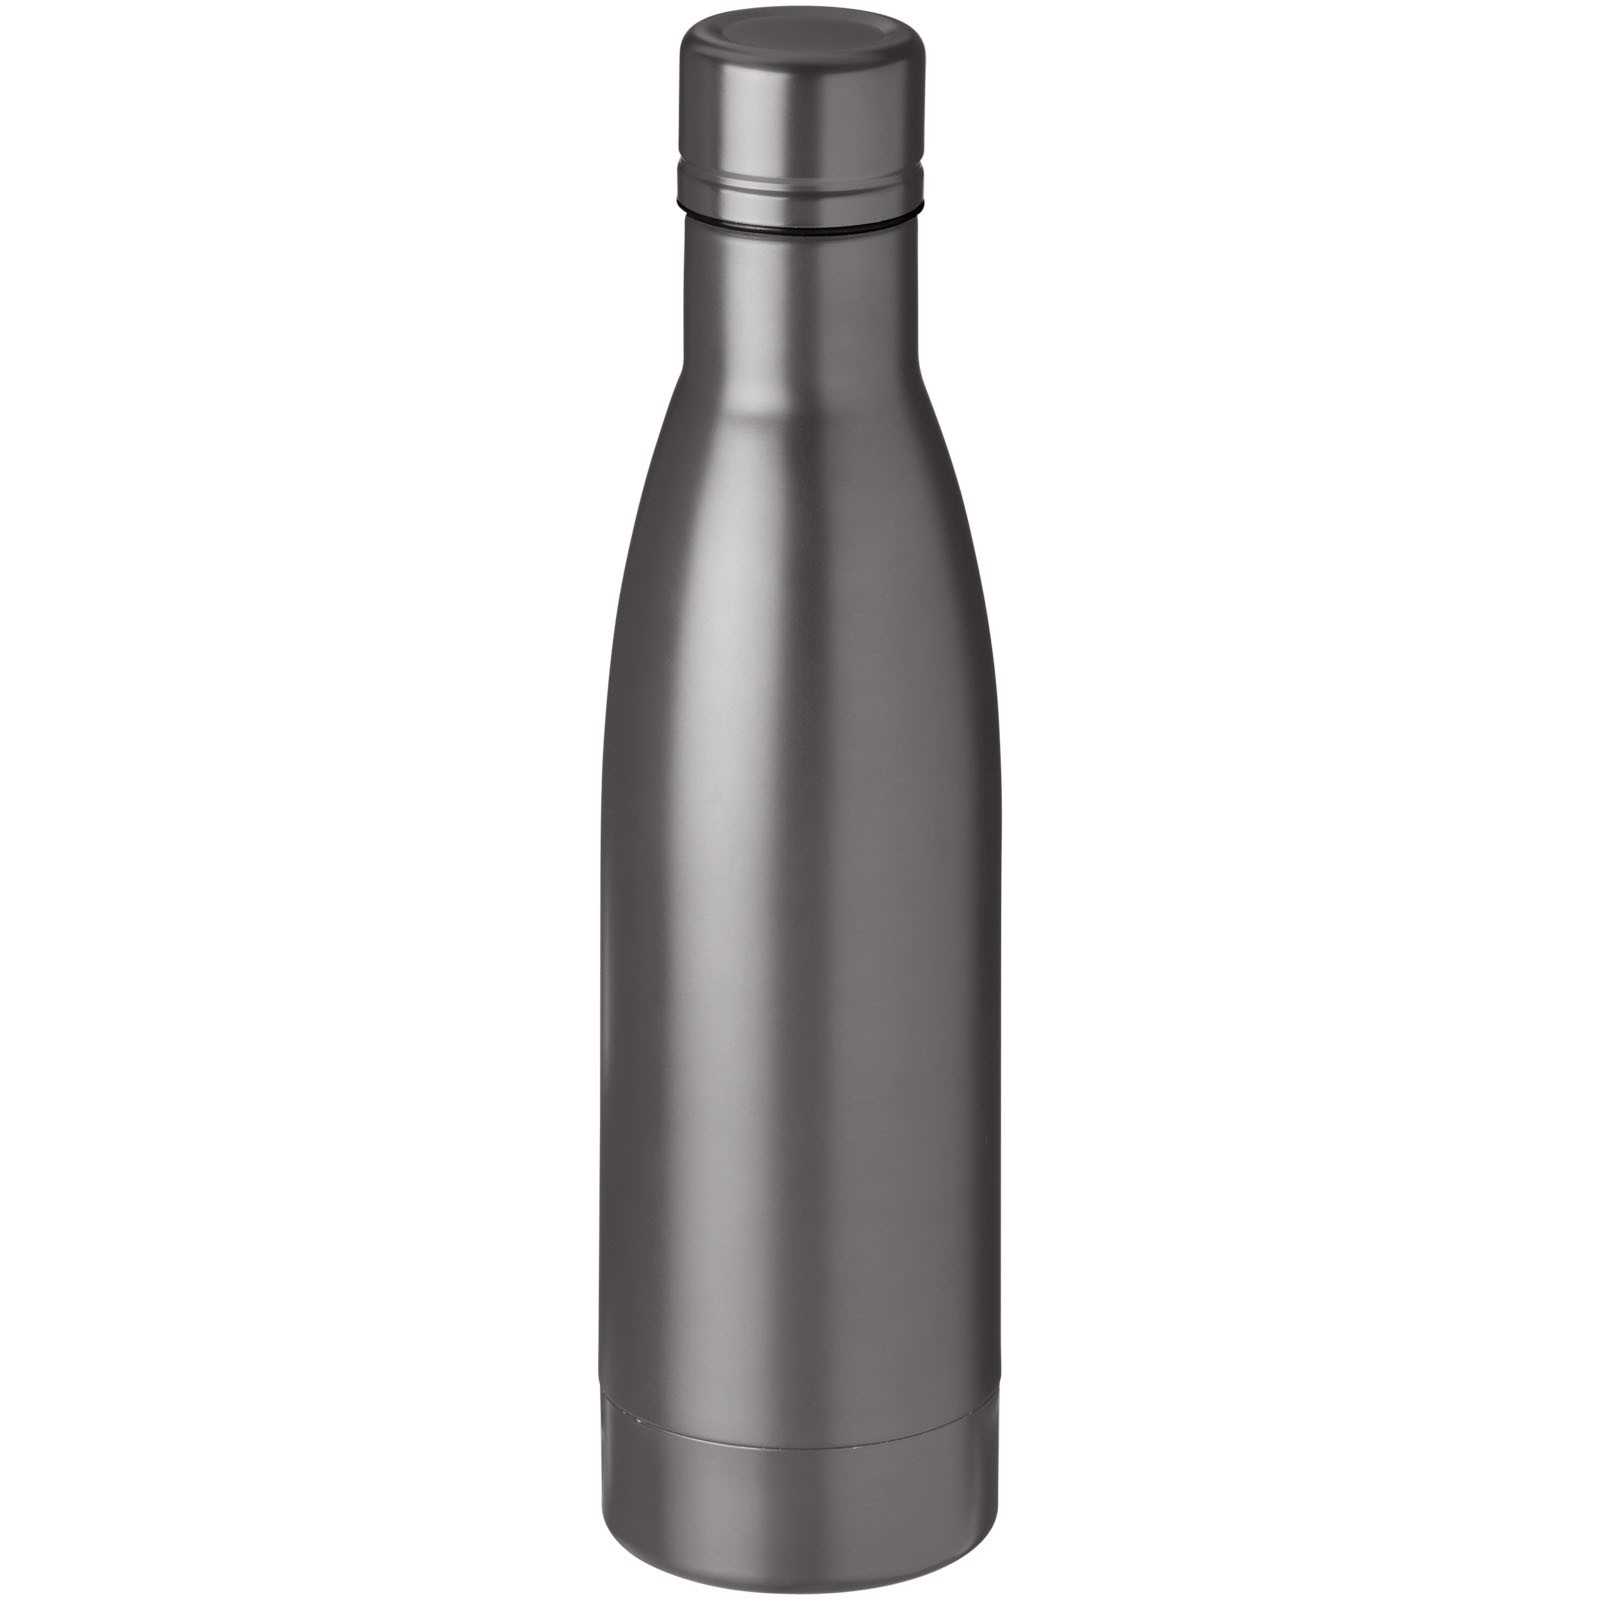 Vasa 500 ml Kupfer-Vakuum Isolier-Sportflasche - Titan